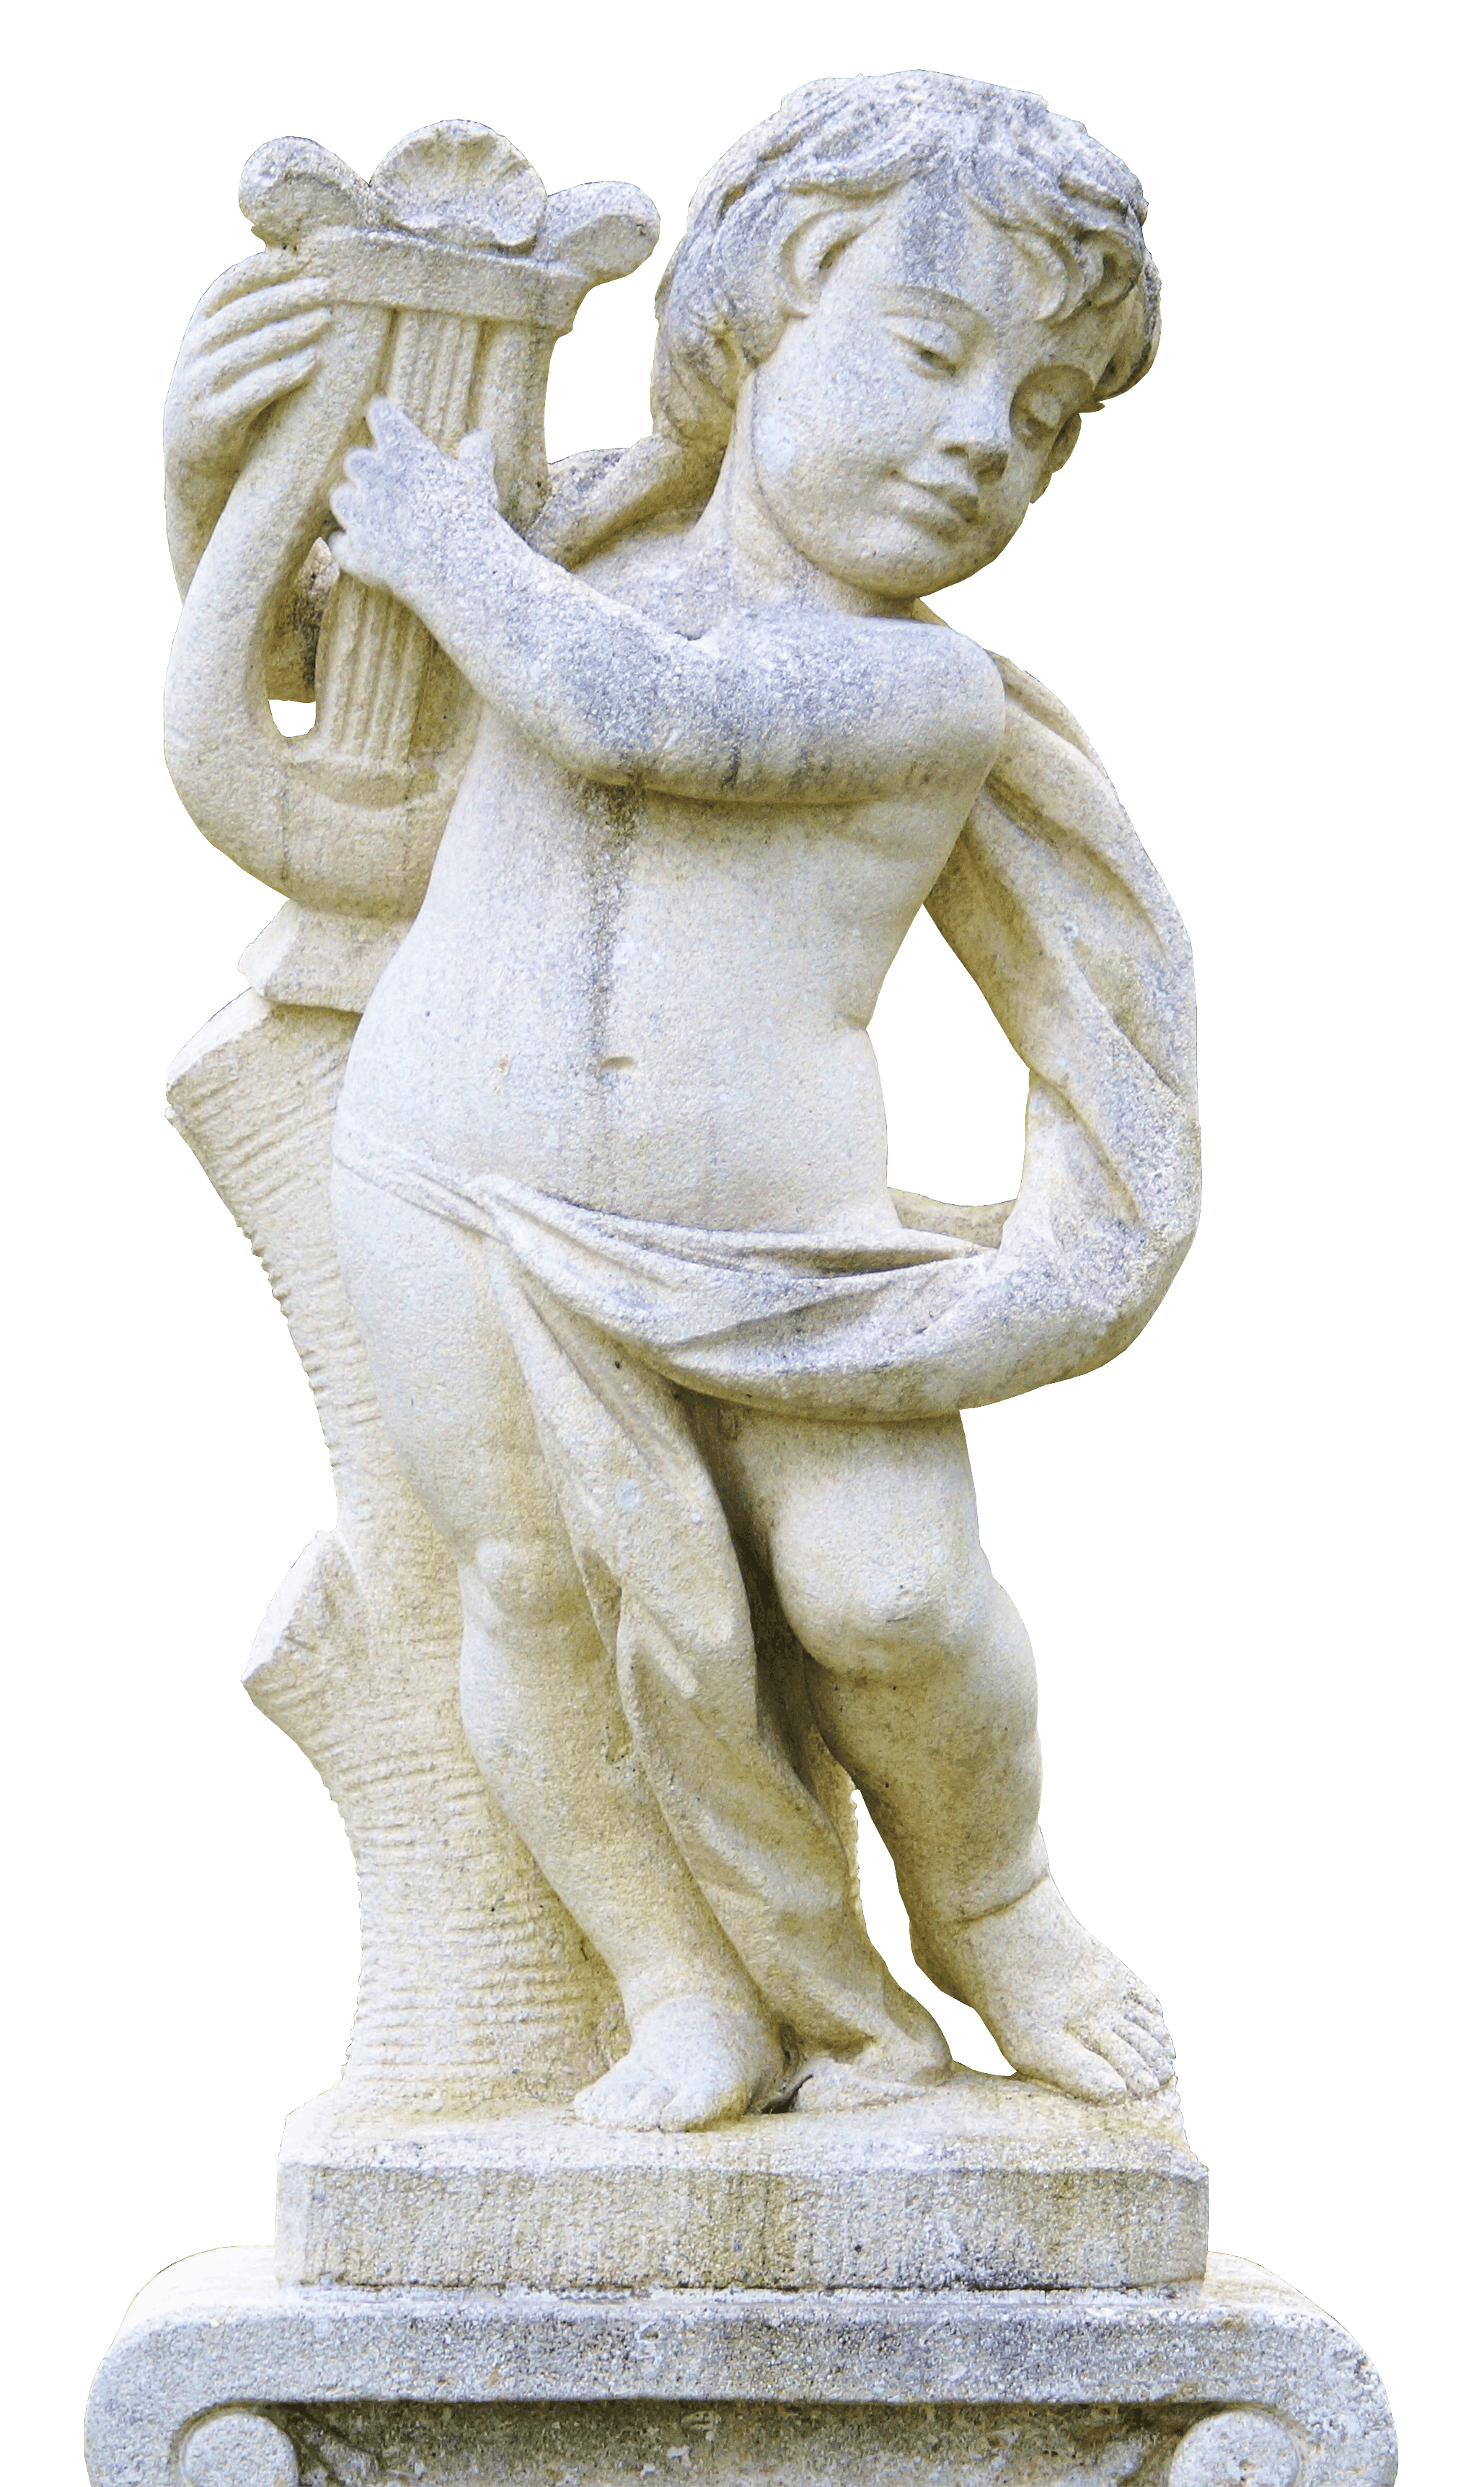 Free stock photo of art, music, church, sculpture